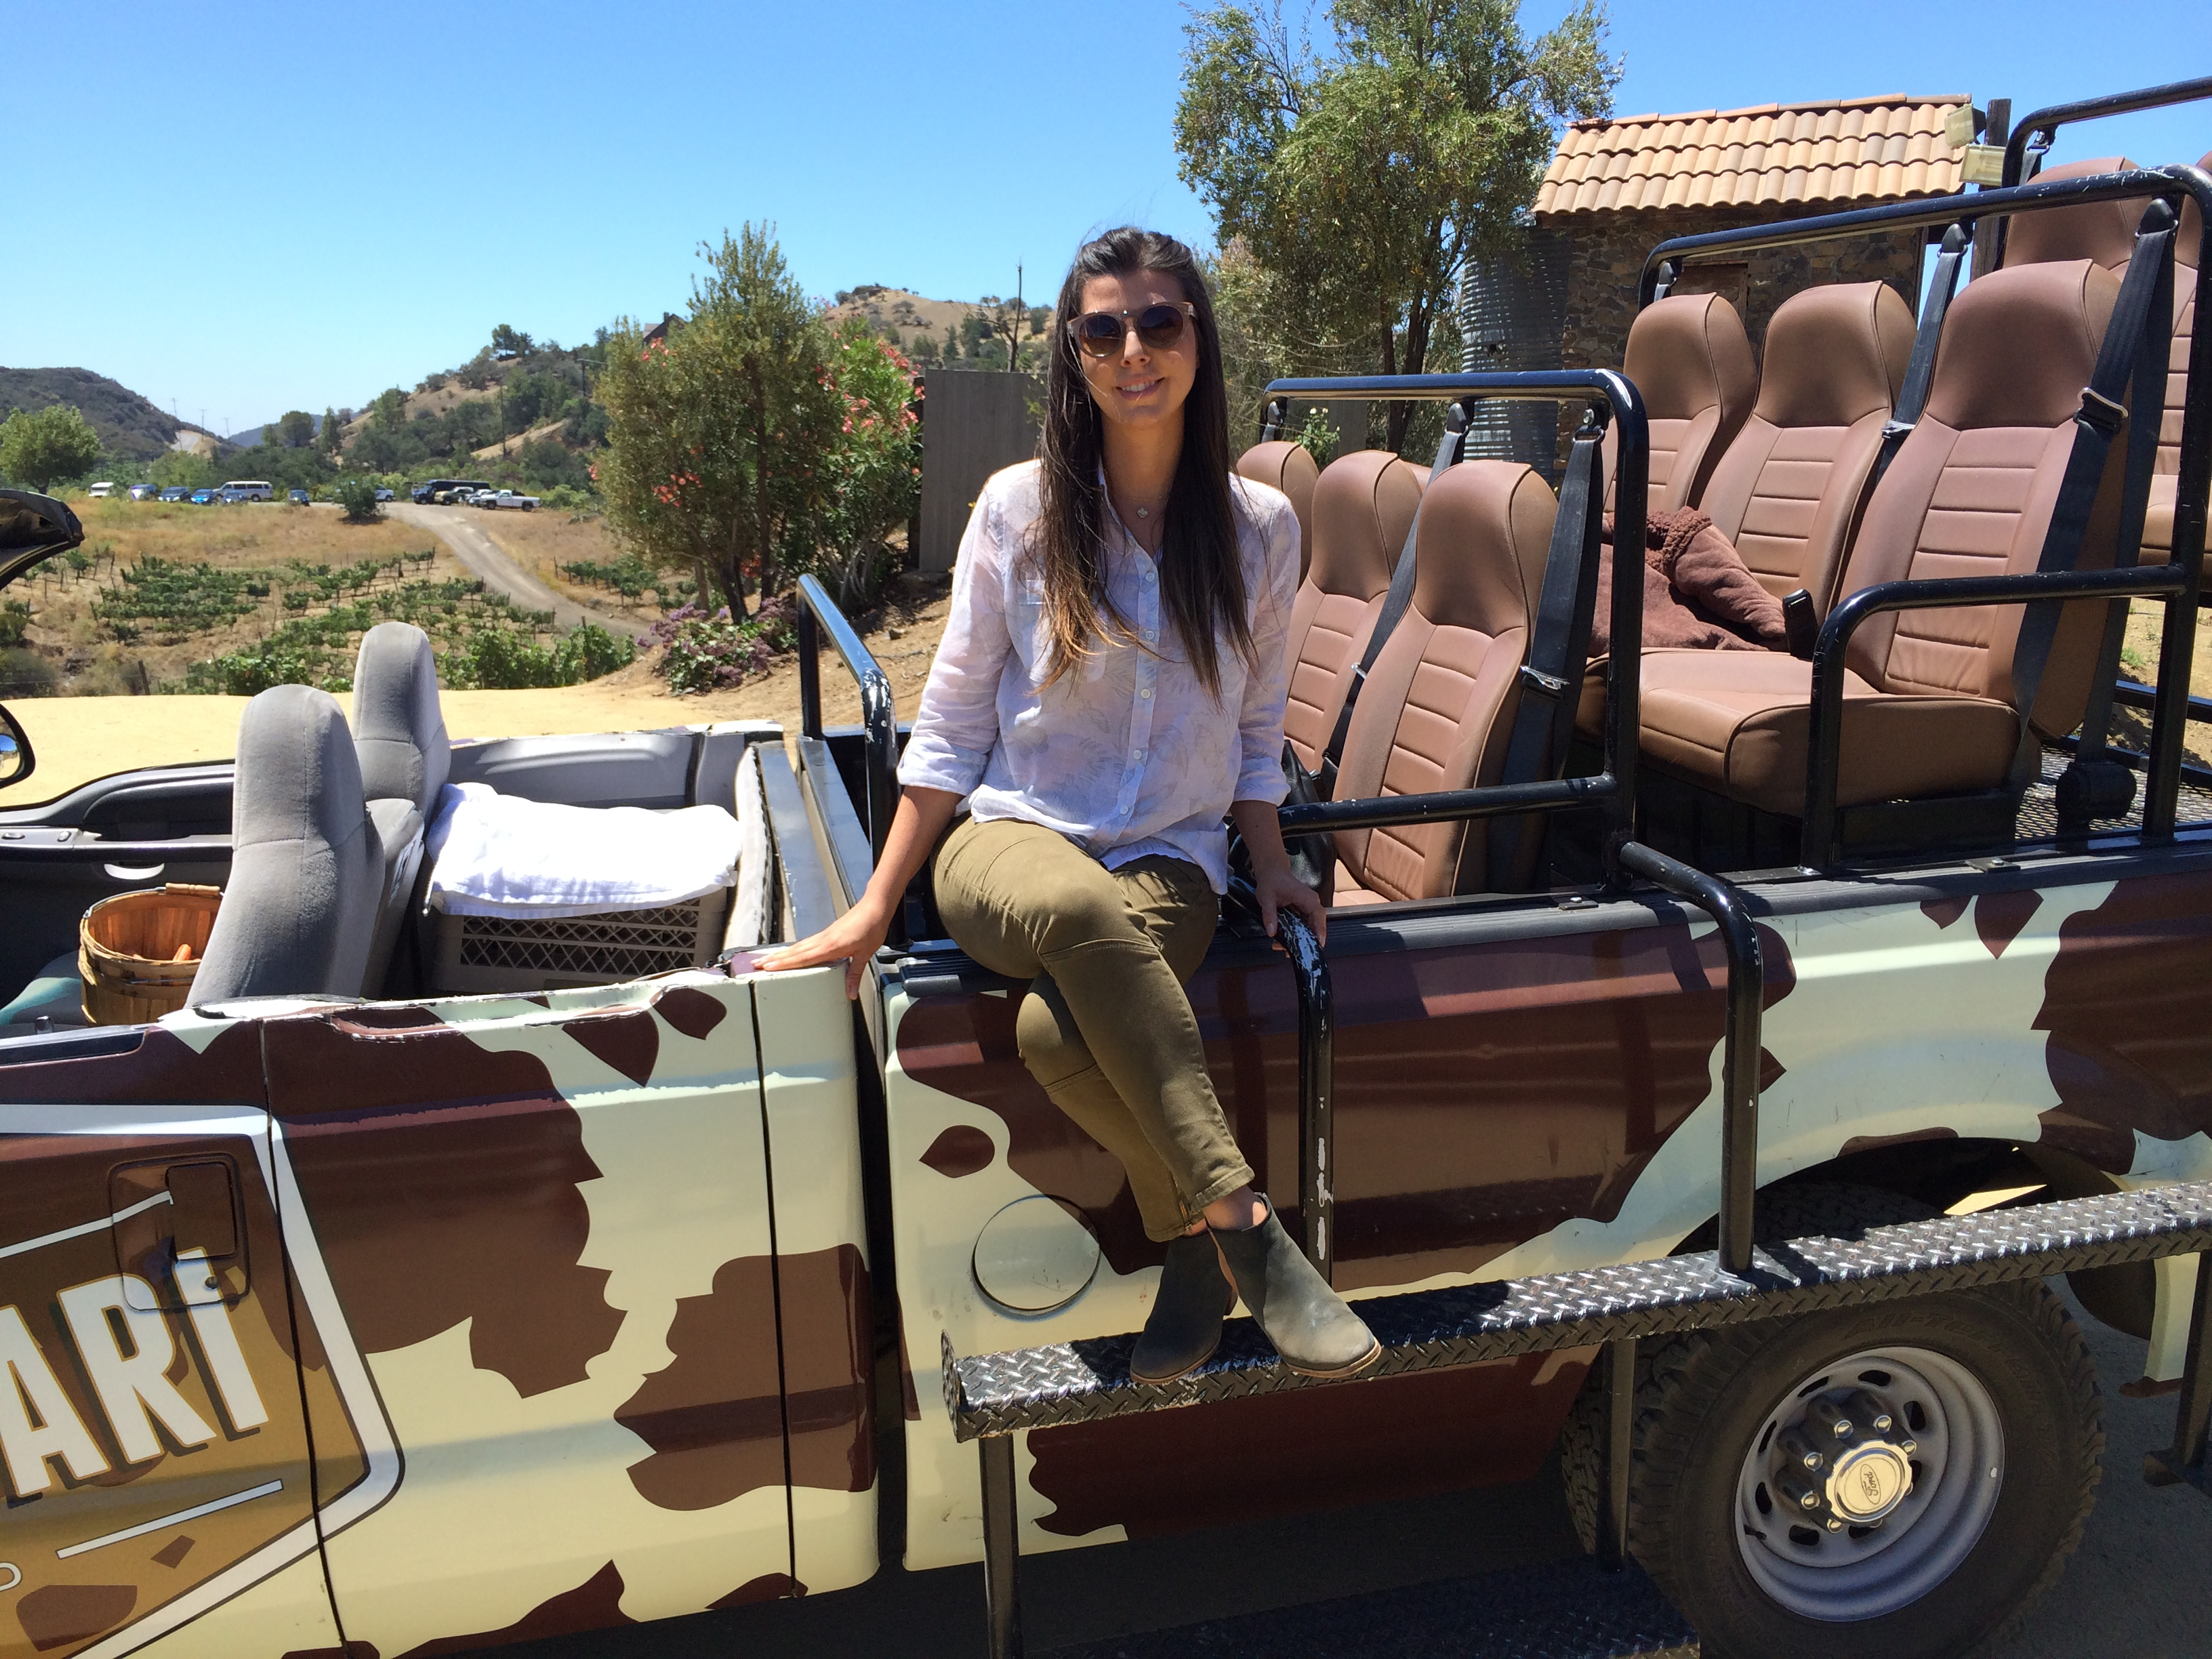 Malibu Wine Safari Helloloverboy